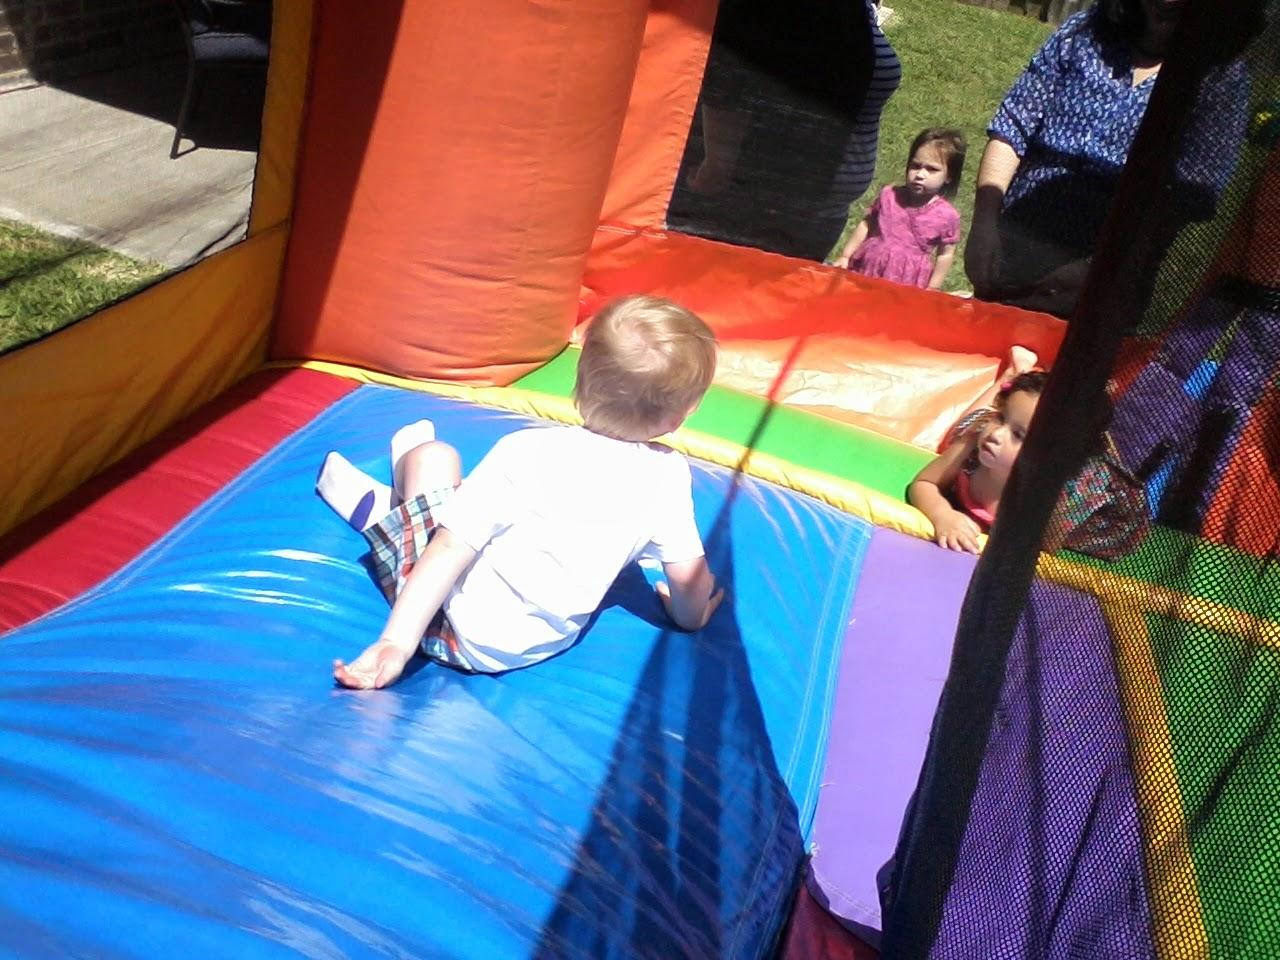 Marshalls Second Birthday Party - 0517113508.jpg